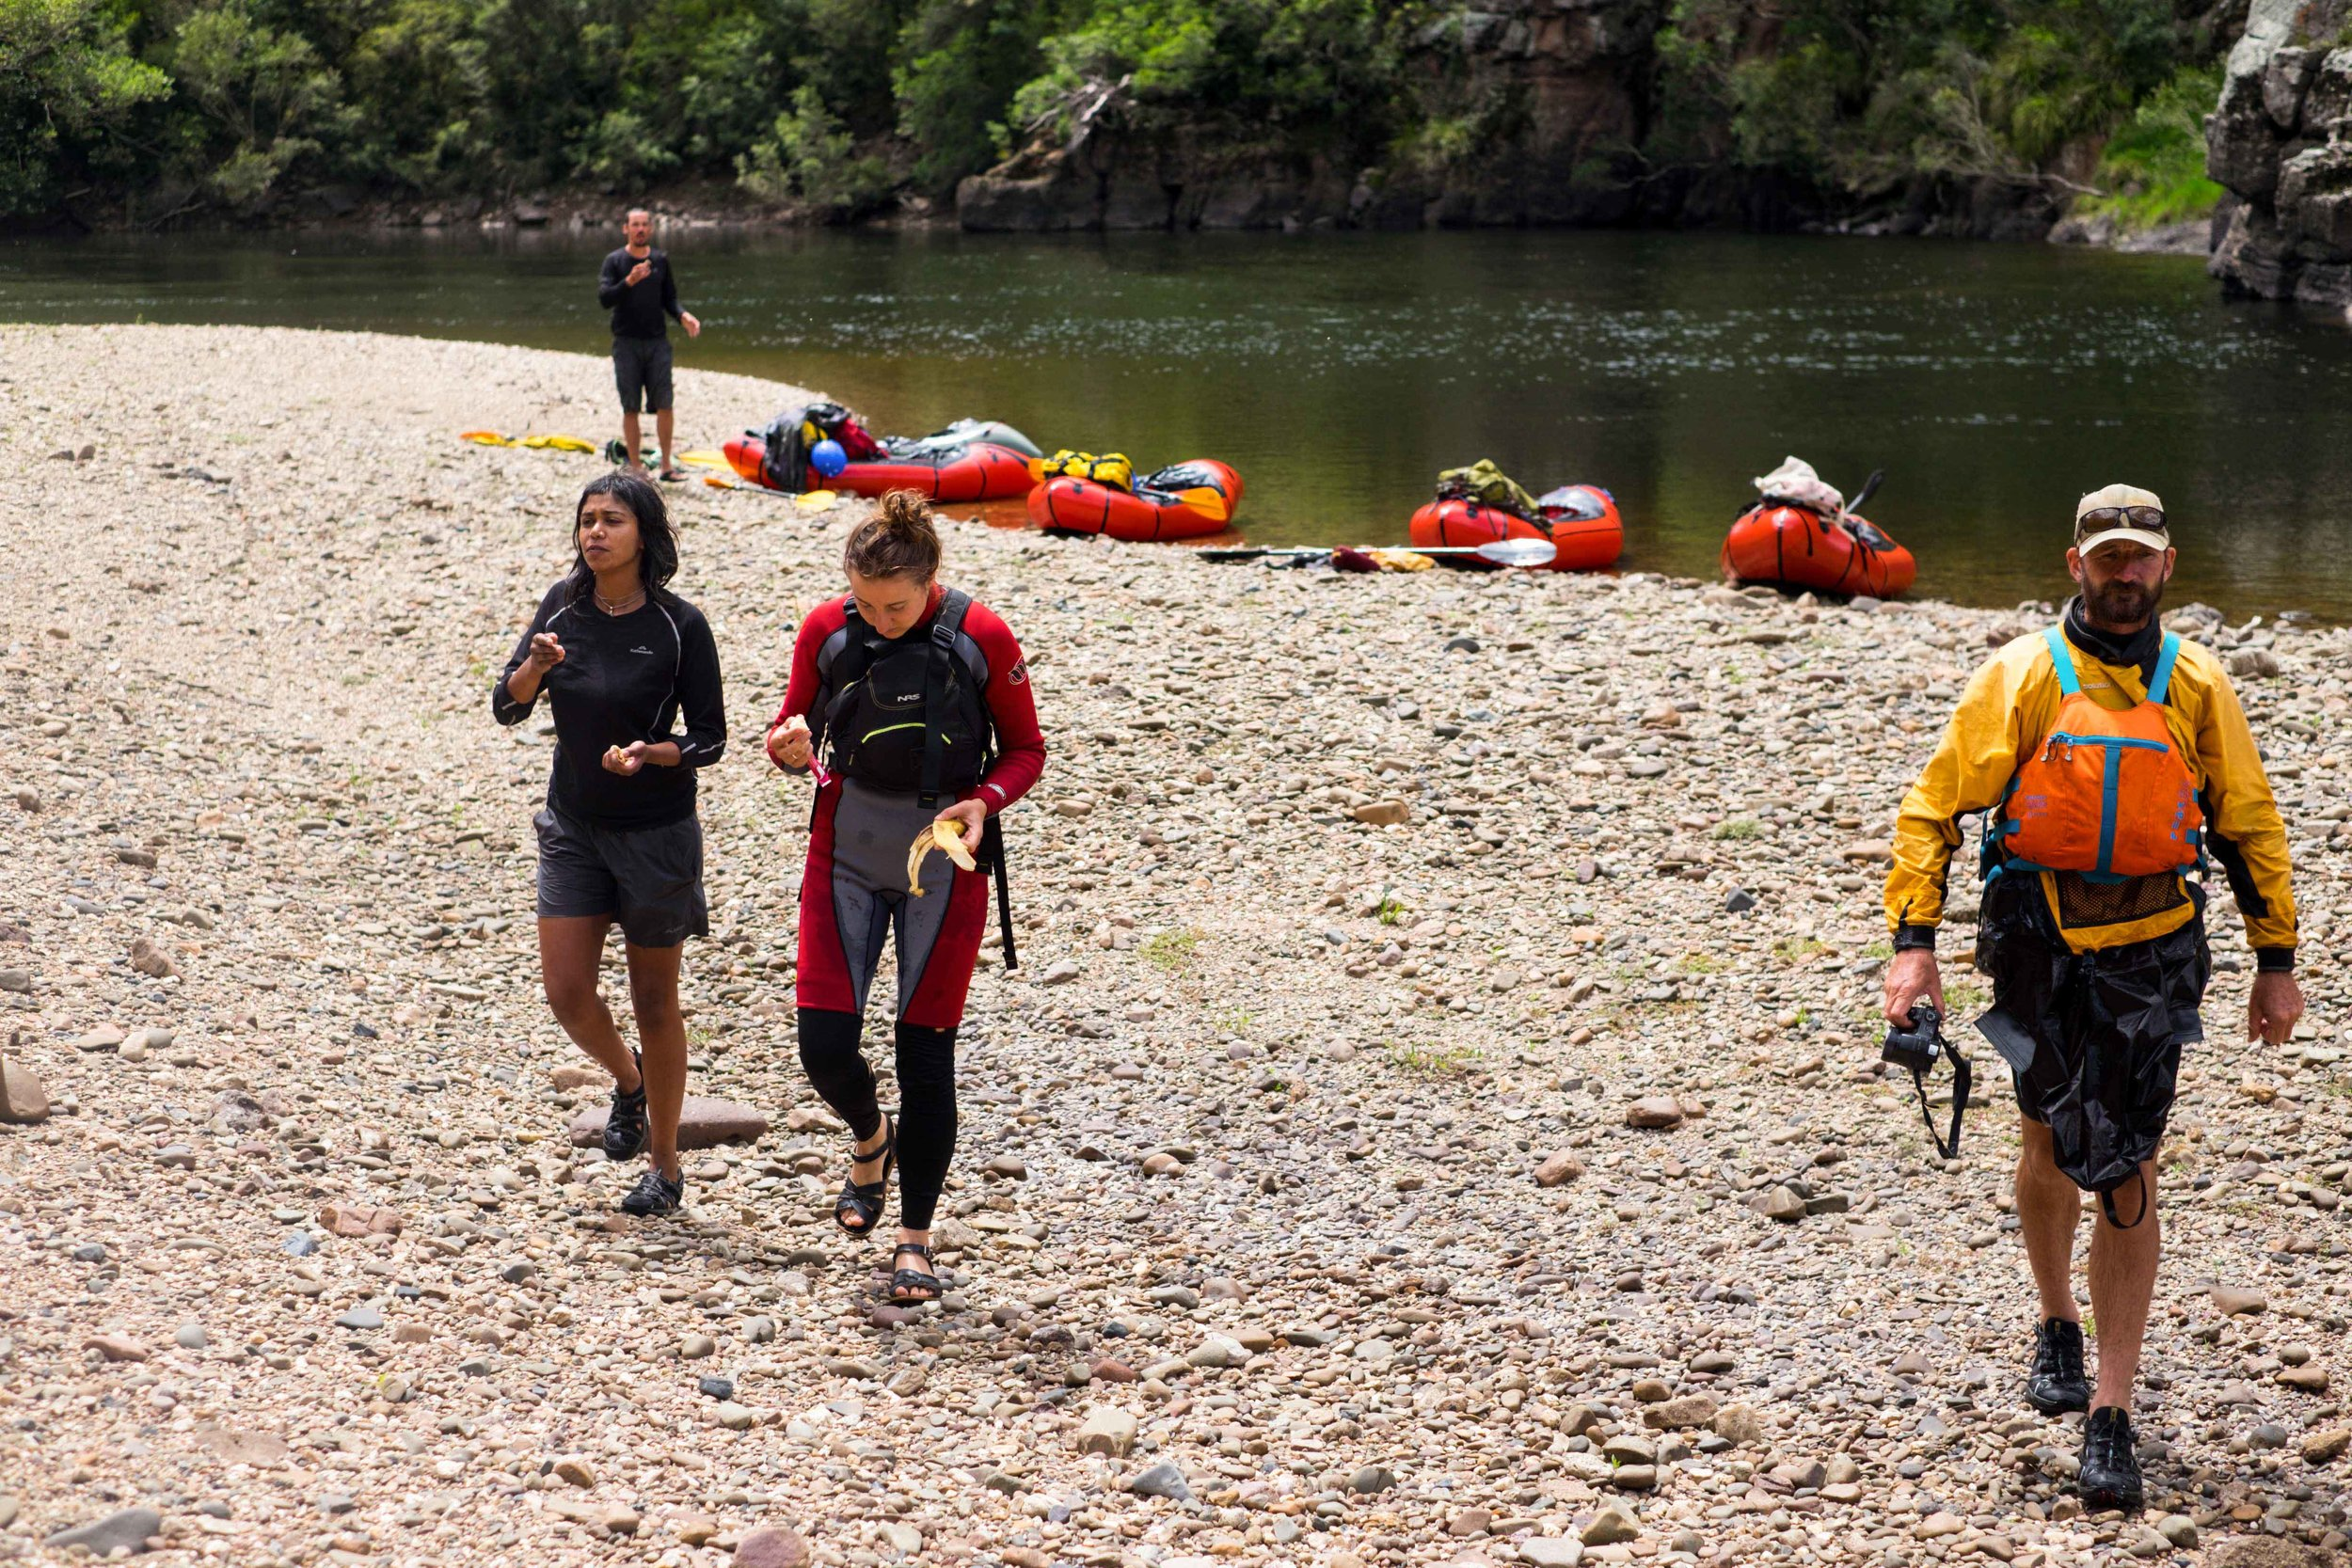 Pack_Raft_Australia_Mitchell_River_Alpacka.jpg